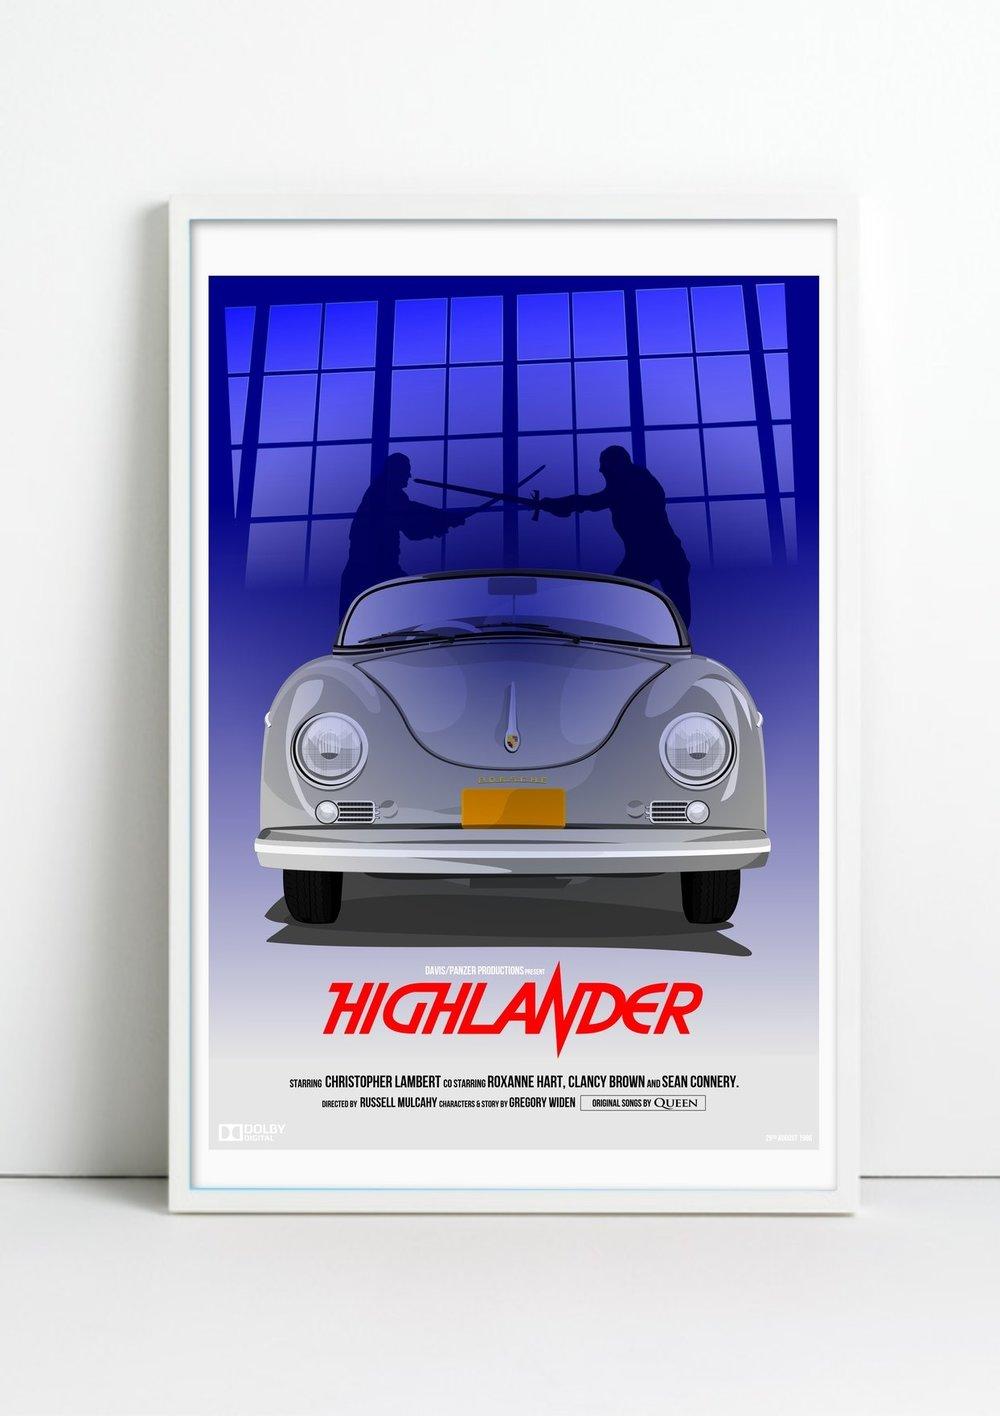 Highlander Frame.jpg